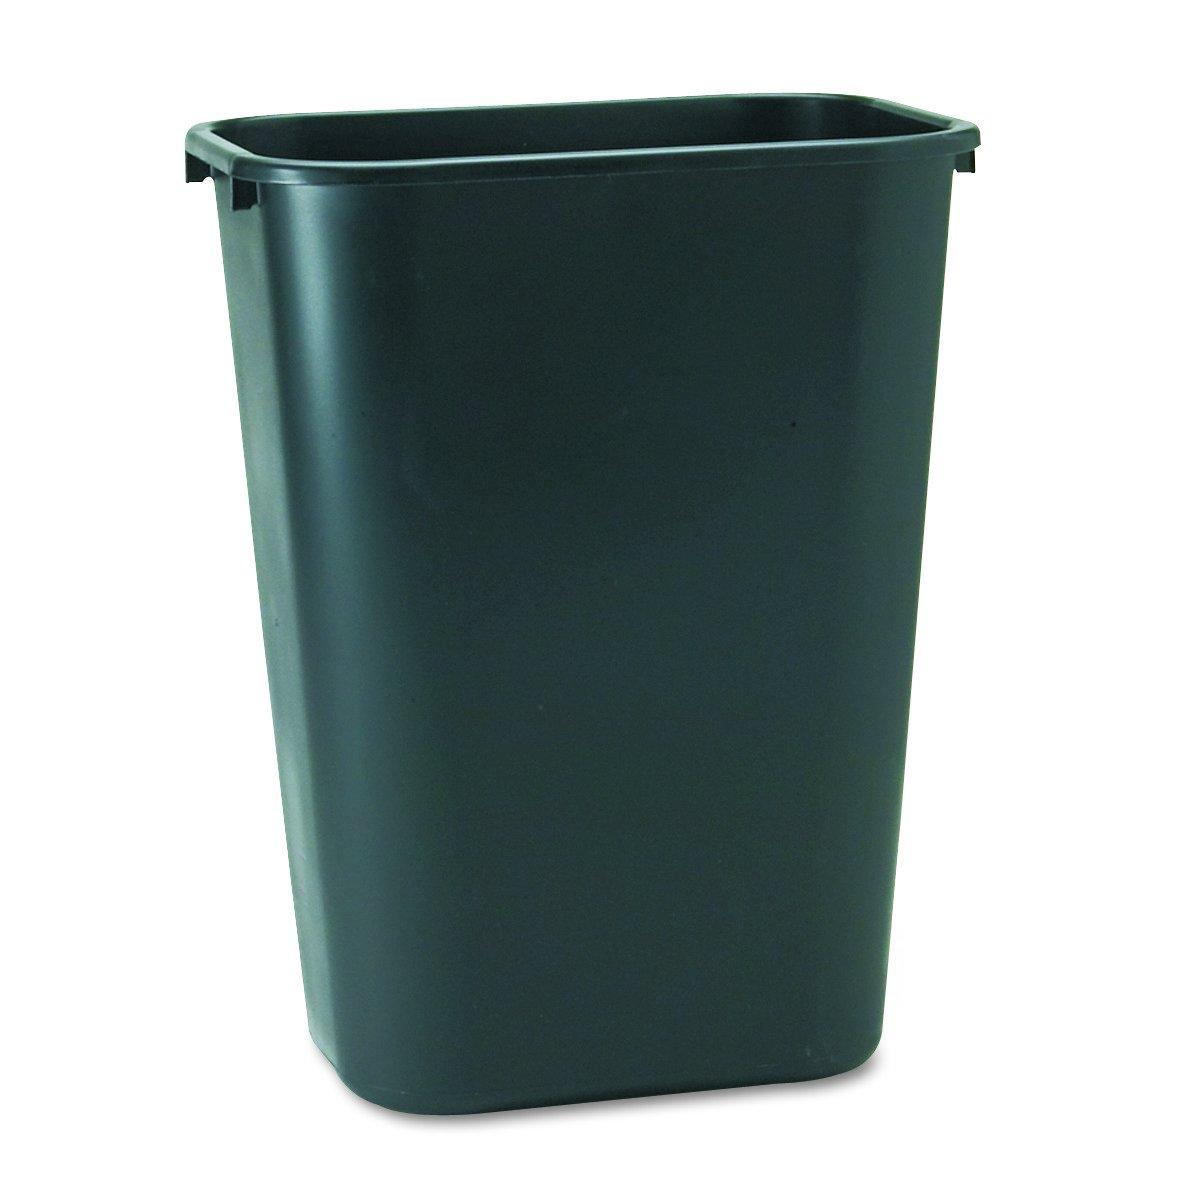 Rubbermaid Commercial 2957 10-Gallon Deskside Large Trash Can, Rectangular, 11'' Width x 15-1/4'' Depth x 19-7/8'' Height, Black